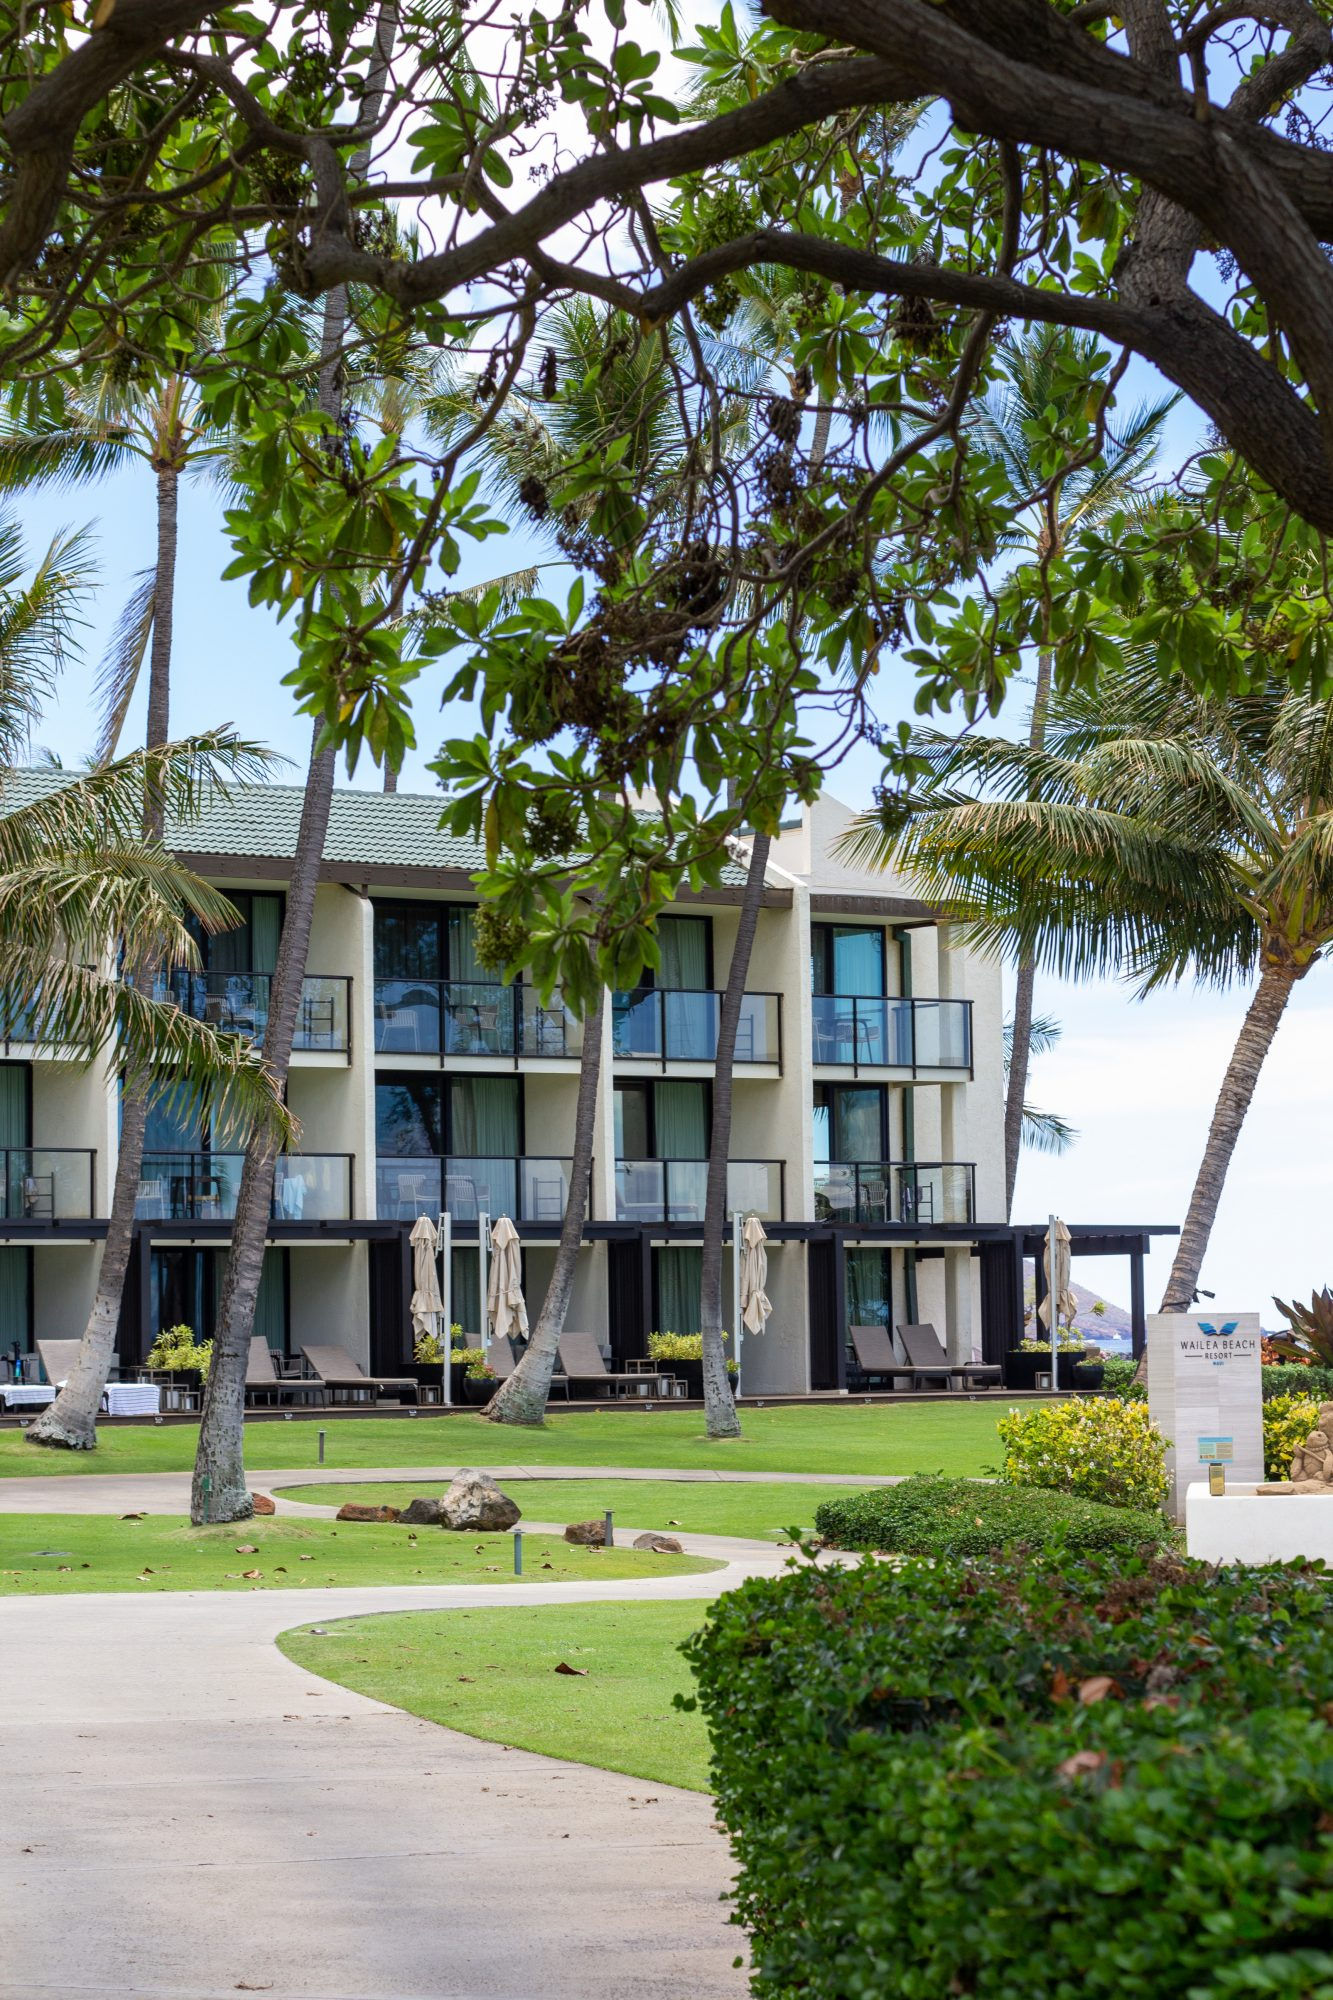 Wailea Beach Resort in Hawaii